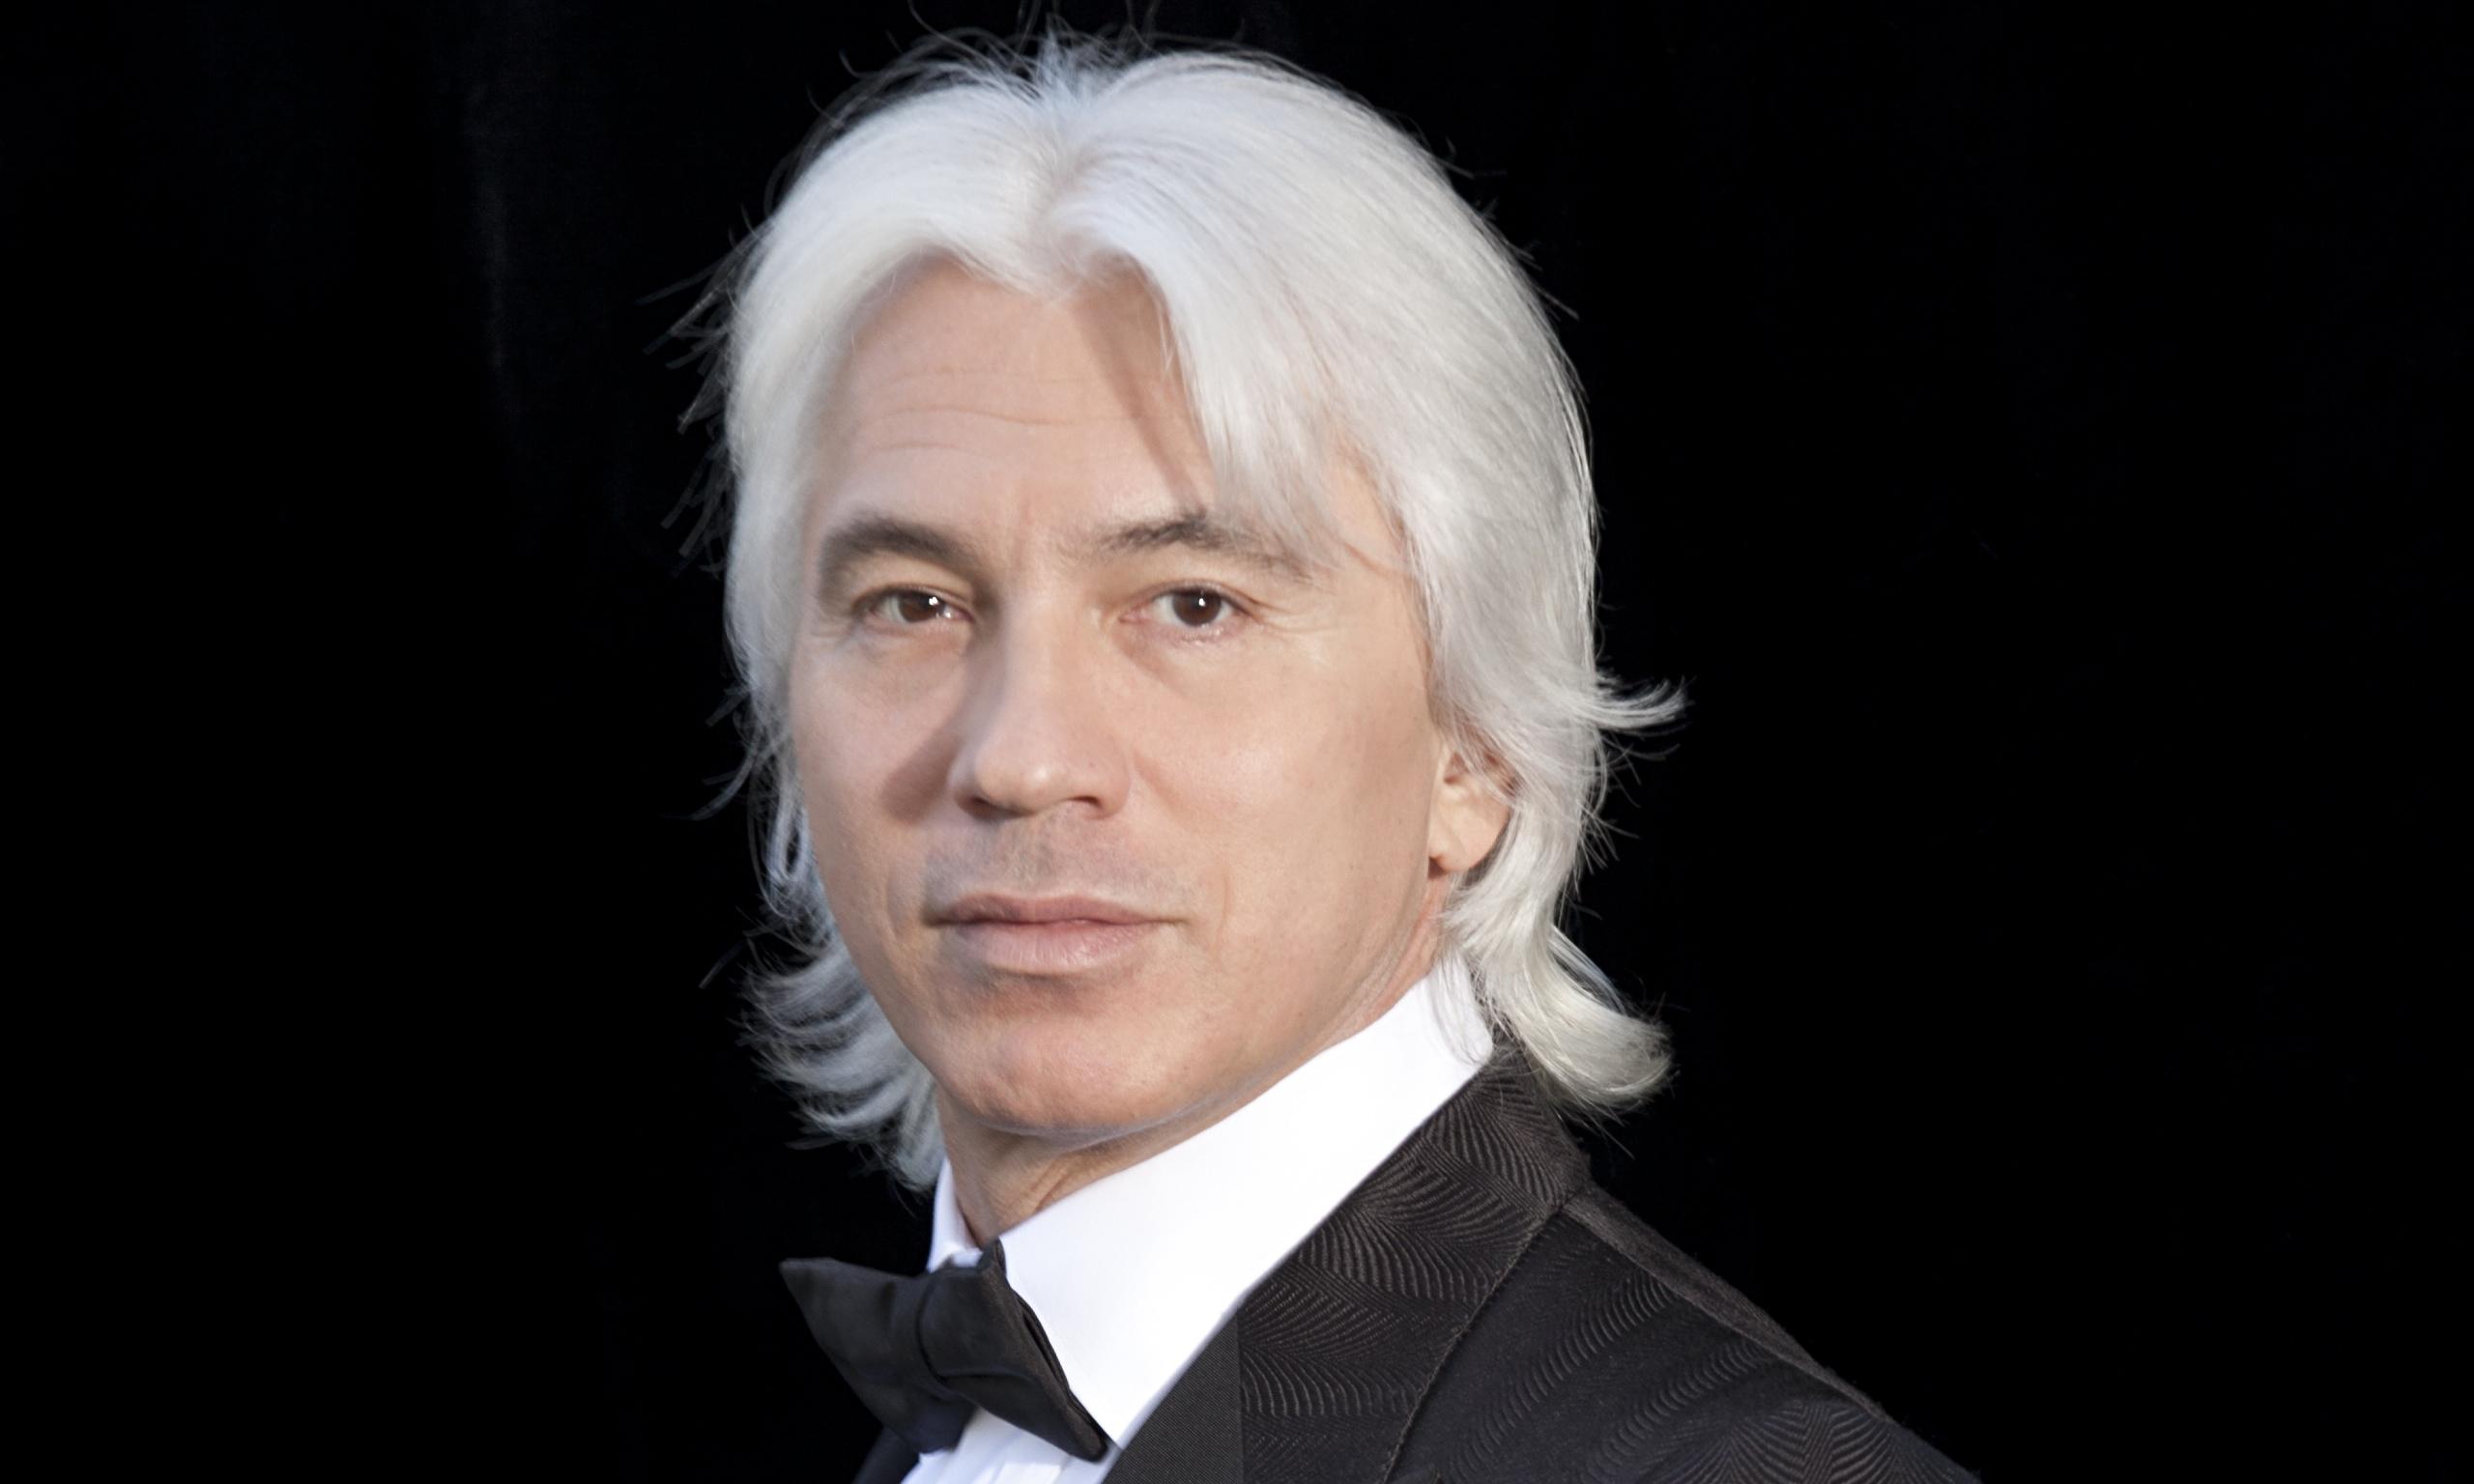 IMG Dmitri Hvorostovsky, Russian Baritone